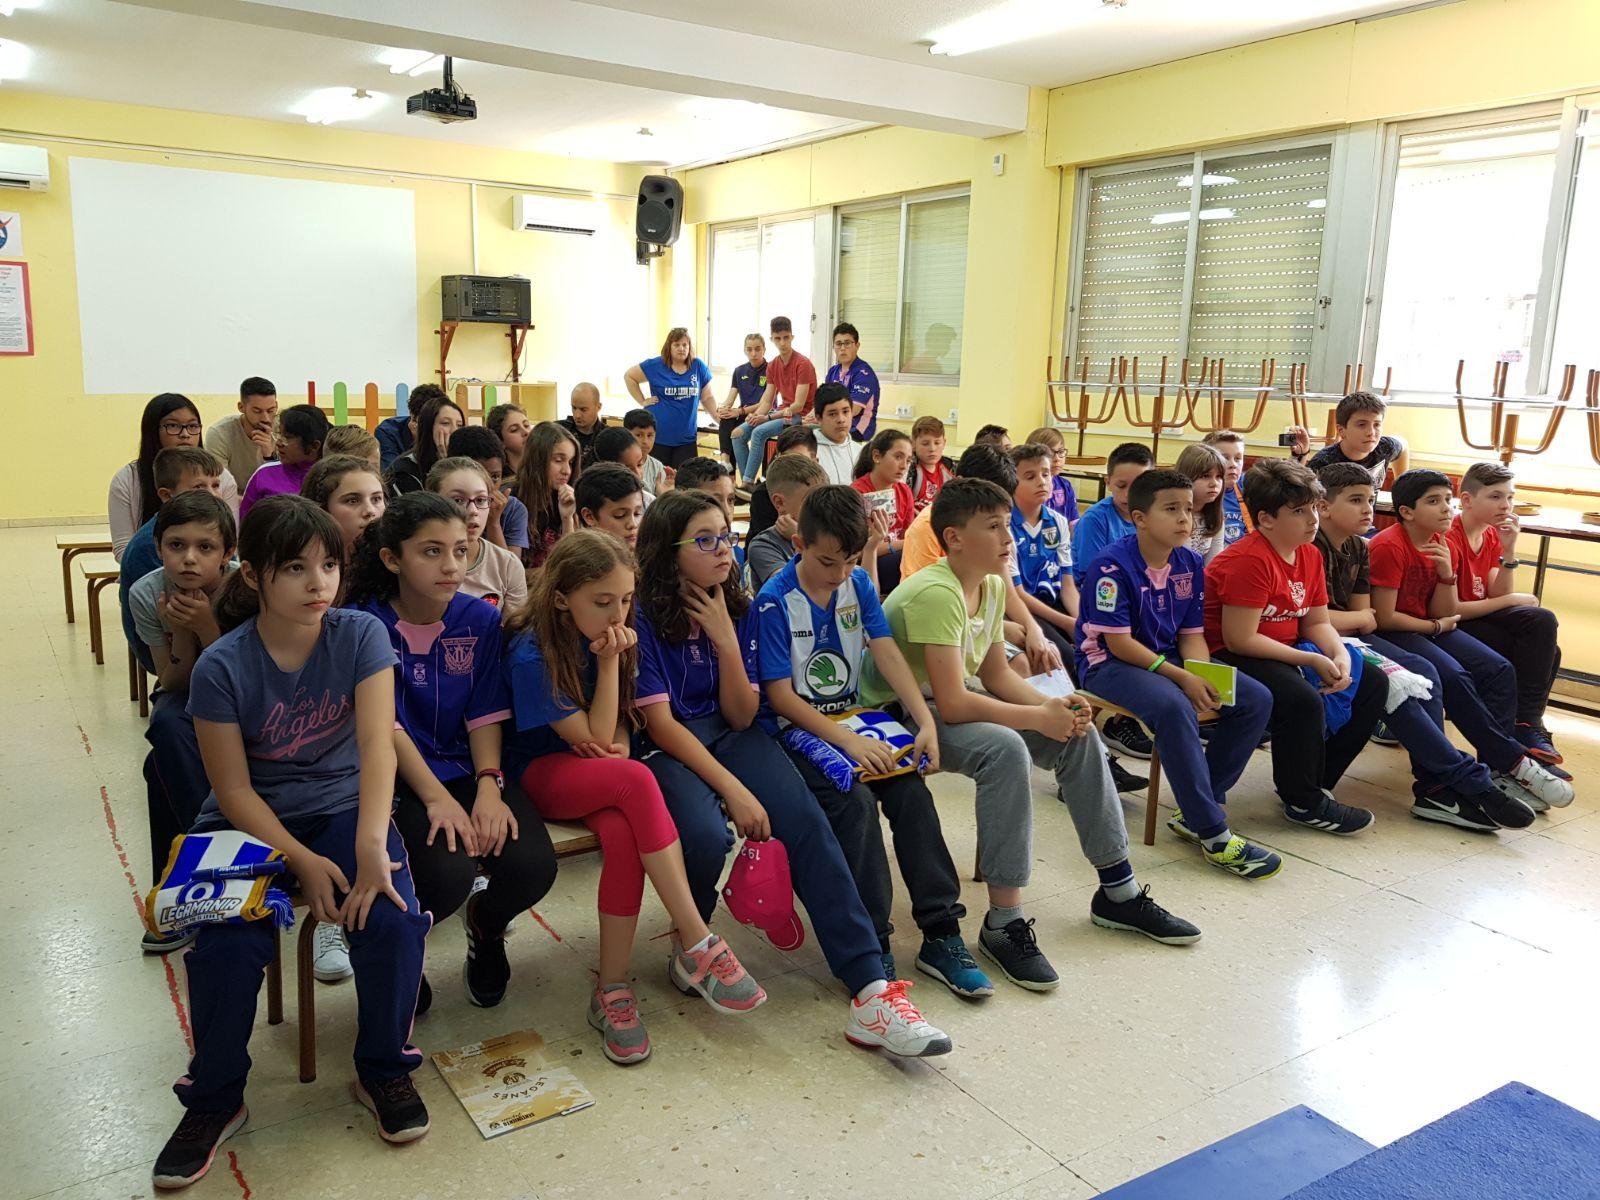 Los jugadores del C.F. Leganés visitan el cole 4